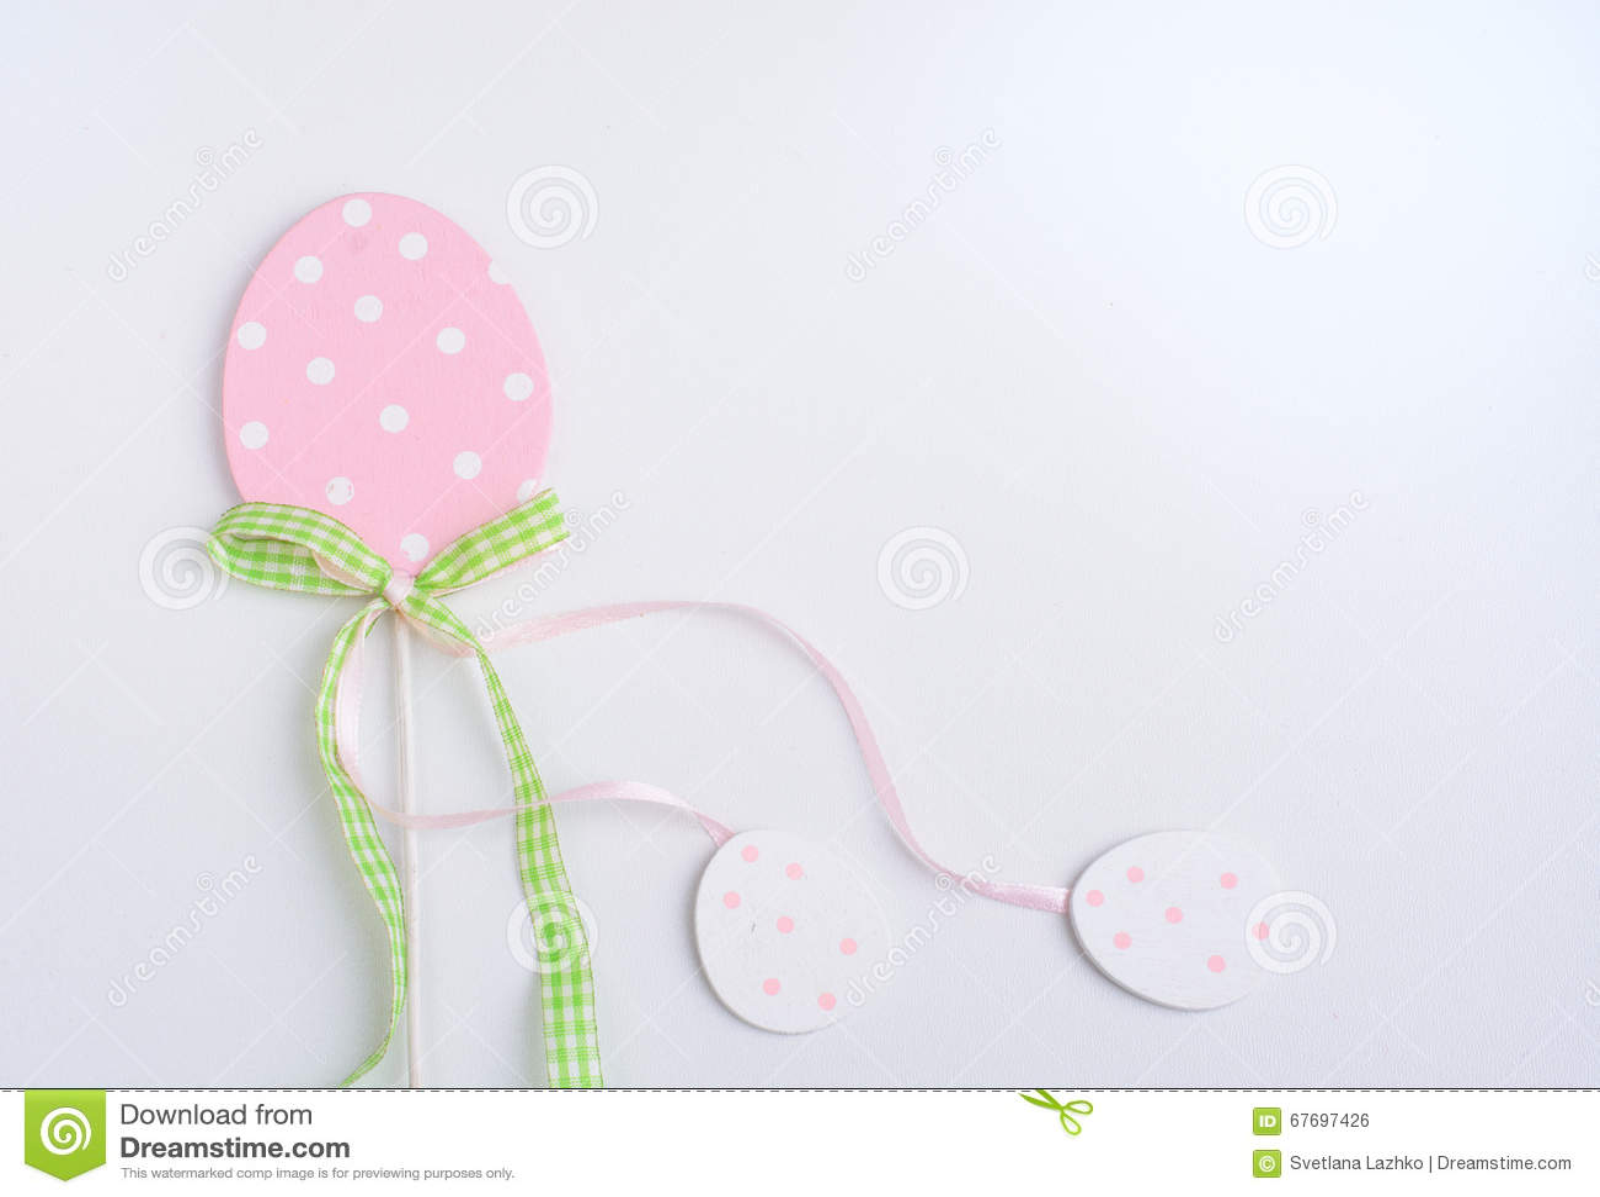 Easter pastel decor on white background.